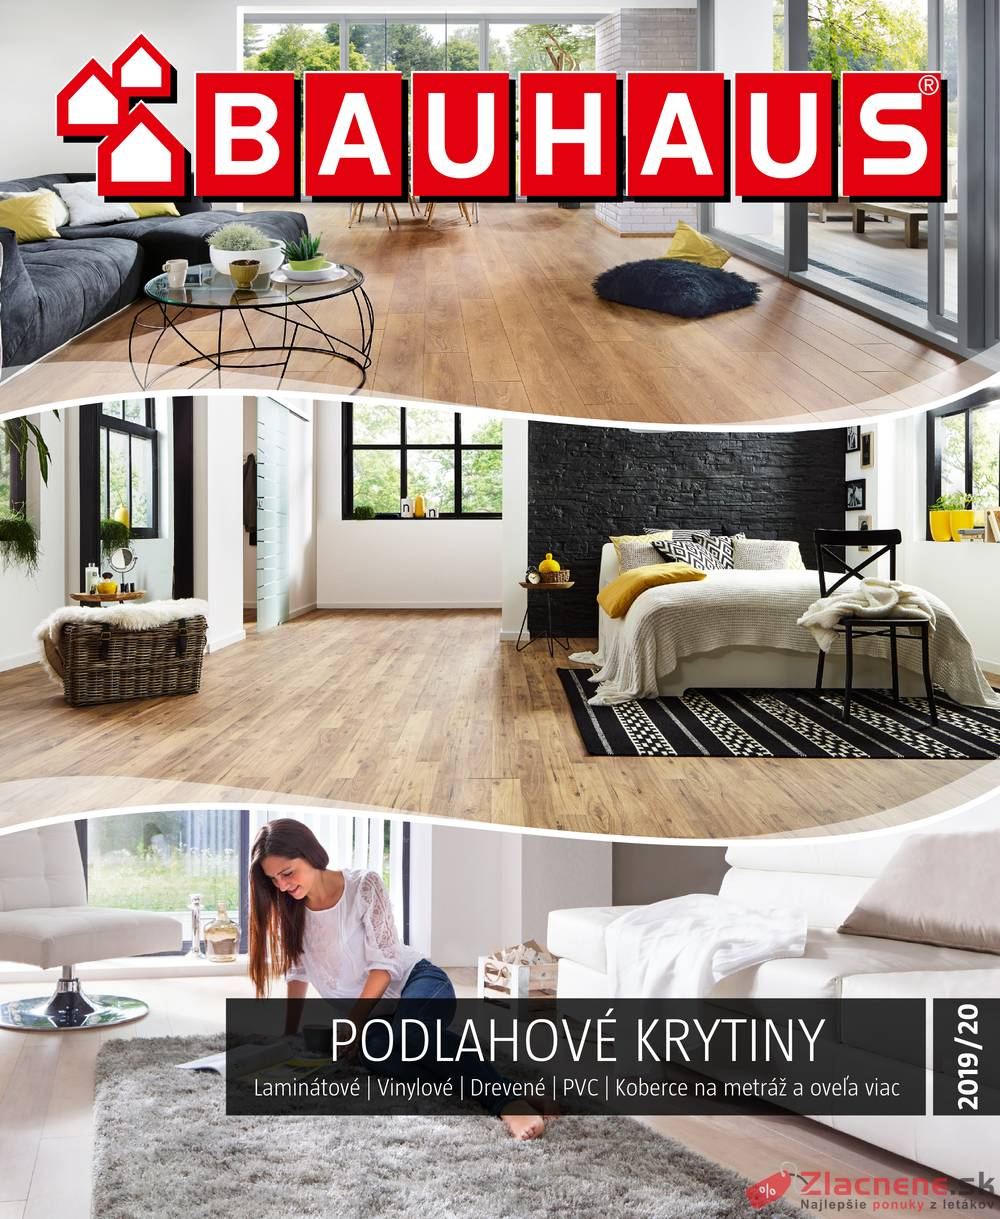 Leták Bauhaus - Bauhaus PODLAHOVÉ KRYTINY od 14.10. do 31.3.2020 - strana 1